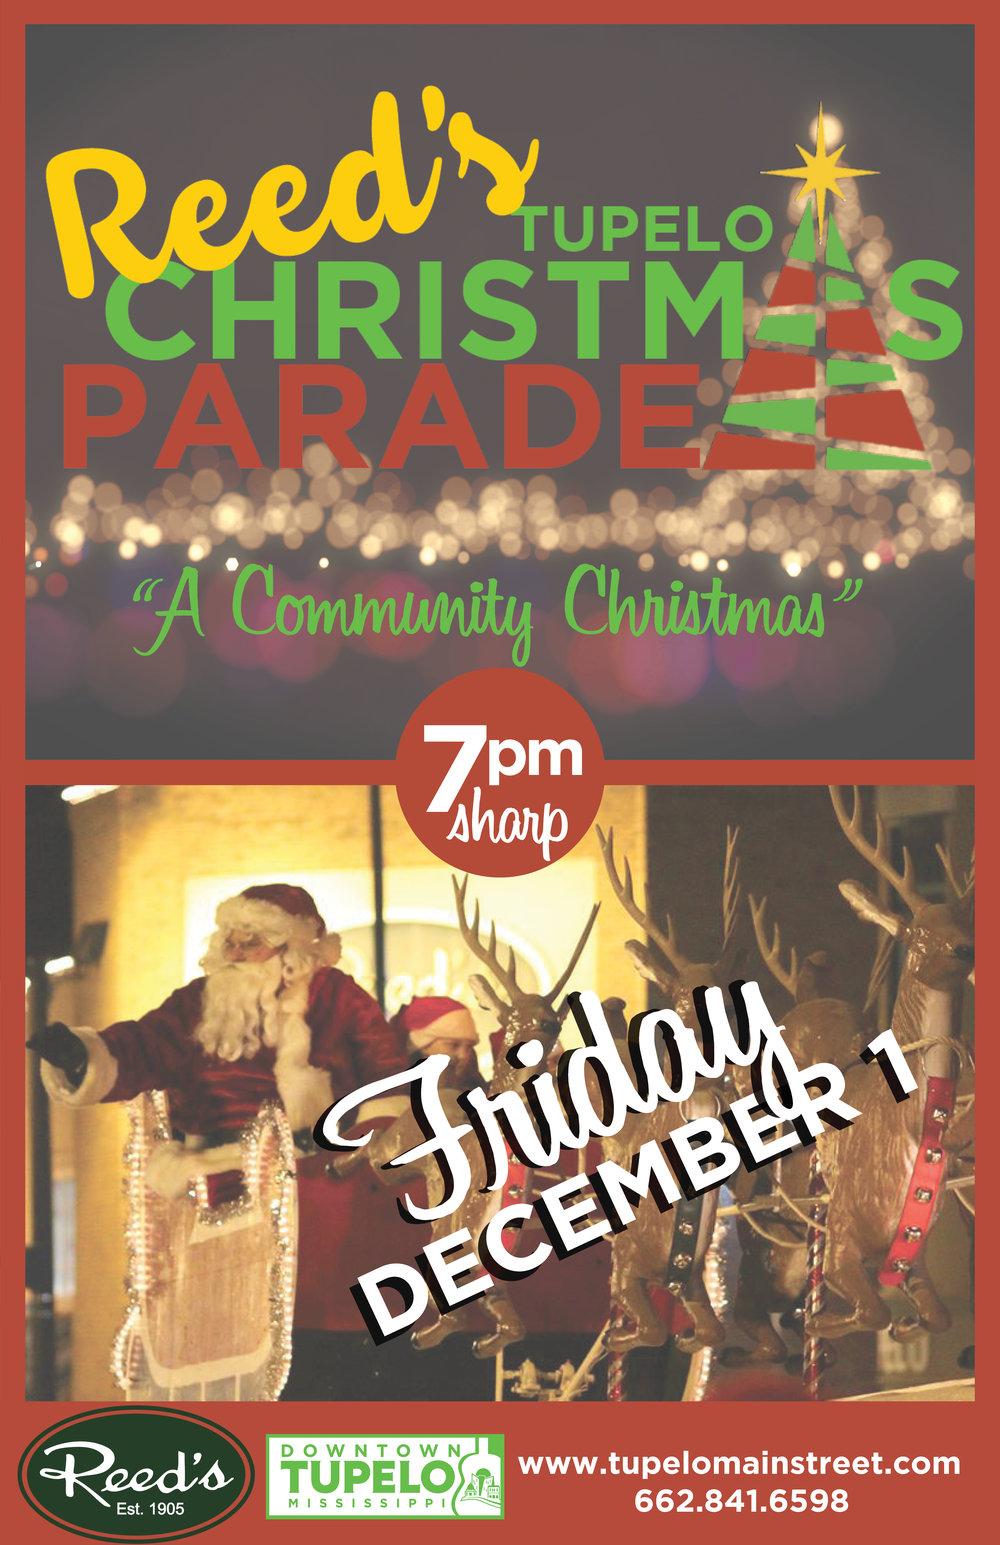 Reed's Christmas Parade Poster.jpg